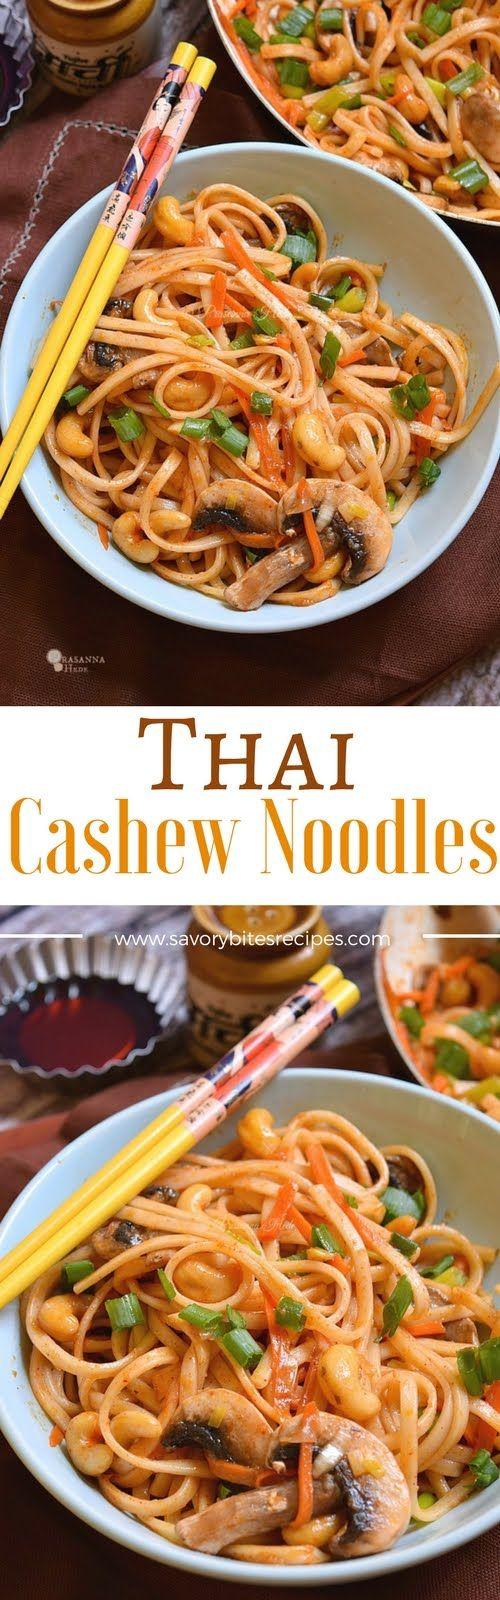 Thai Cashew Noodles - Savory Bites Recipes